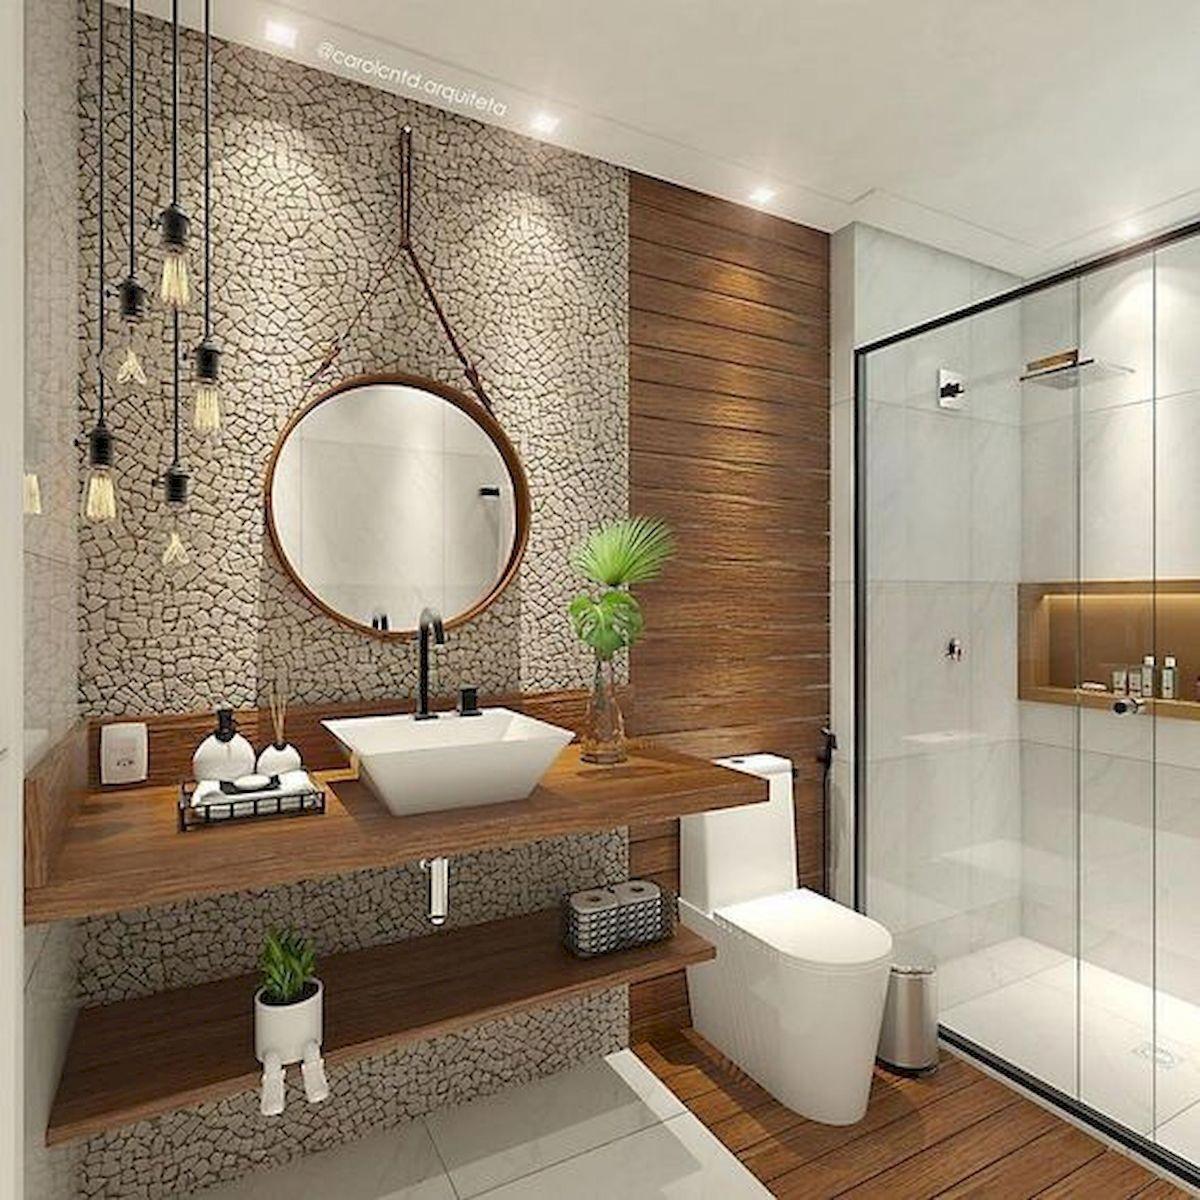 traditional indian bathroom #TraditionalBathroomdesign  Small